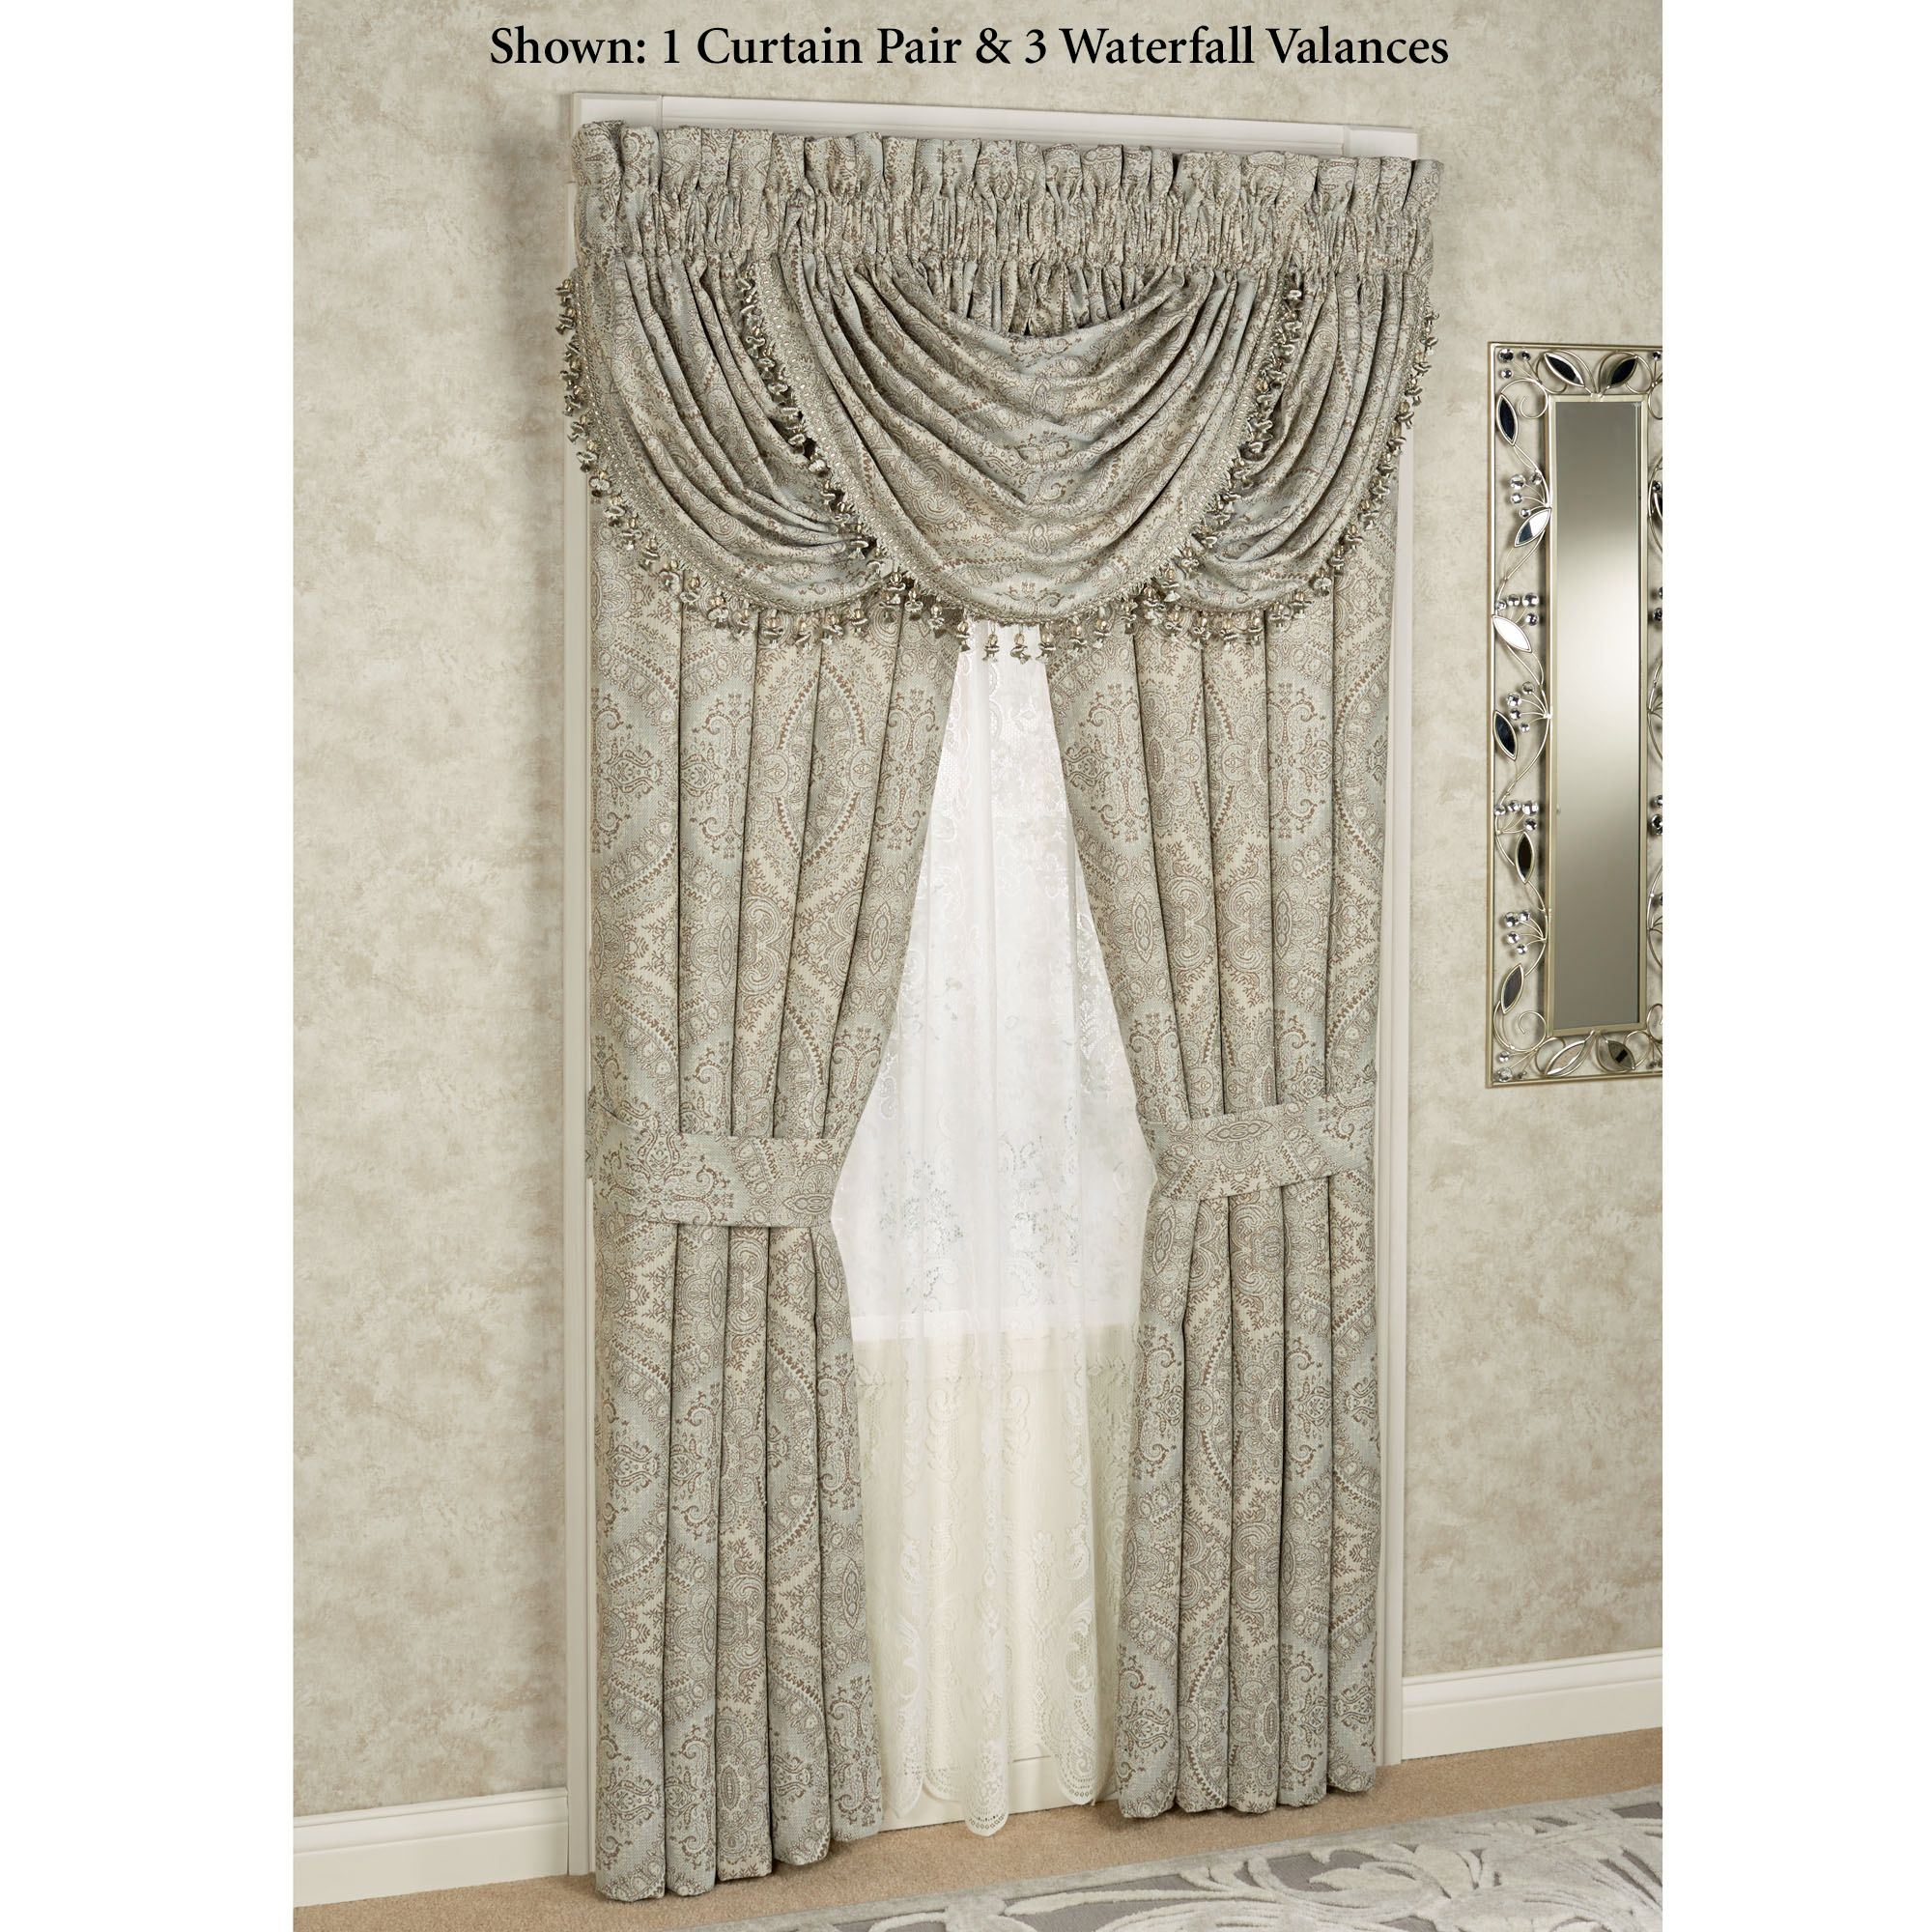 j new top tab curtains rod shower york greeniteconomicsummit oval l curtain image permalink org queen